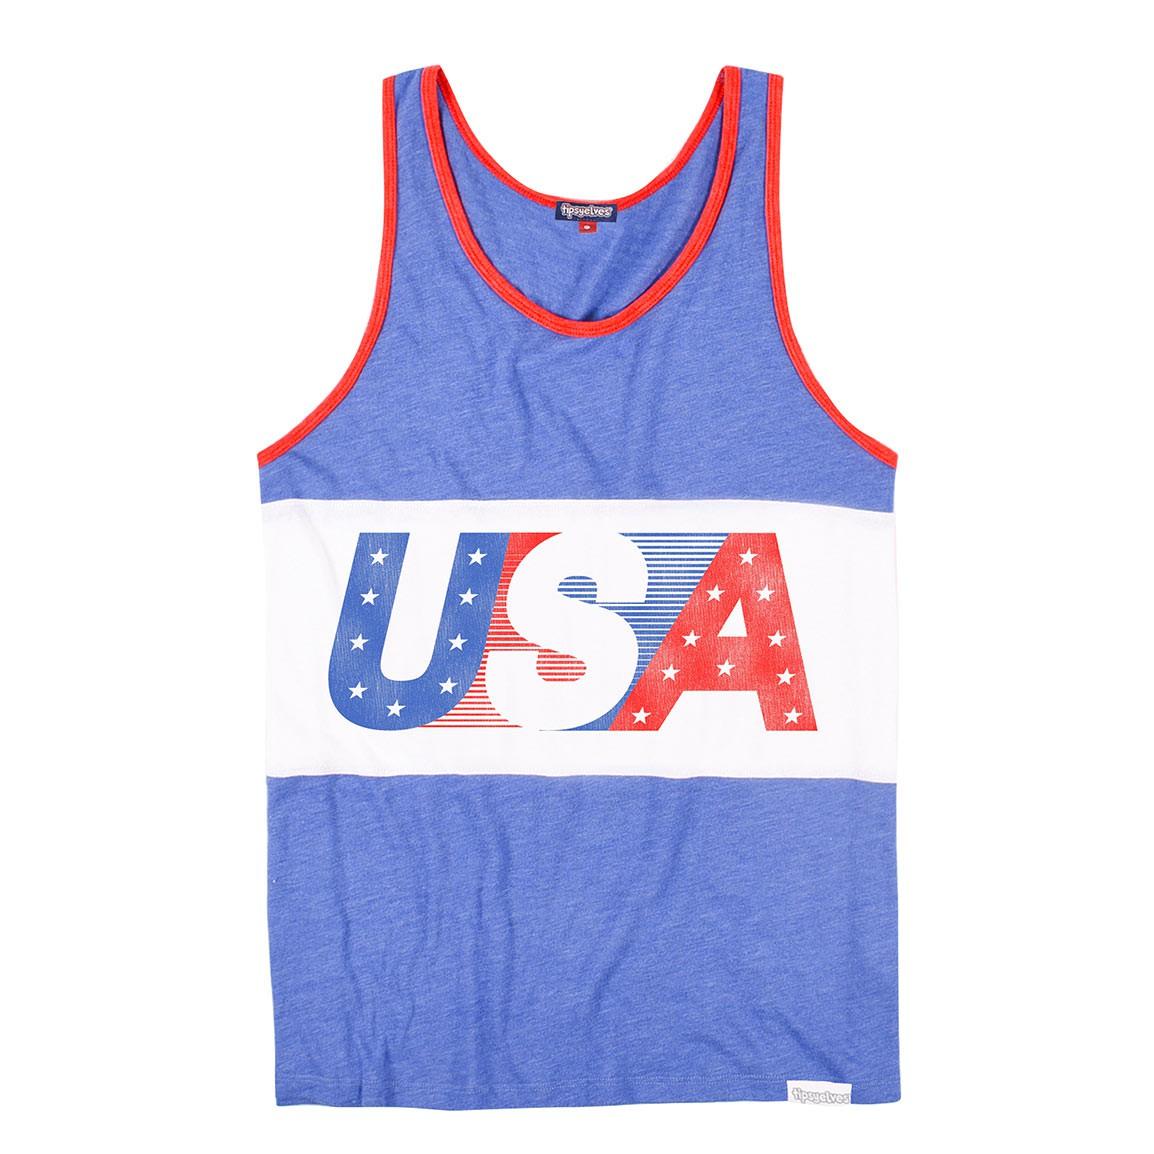 USA Blue Men's Tank Top